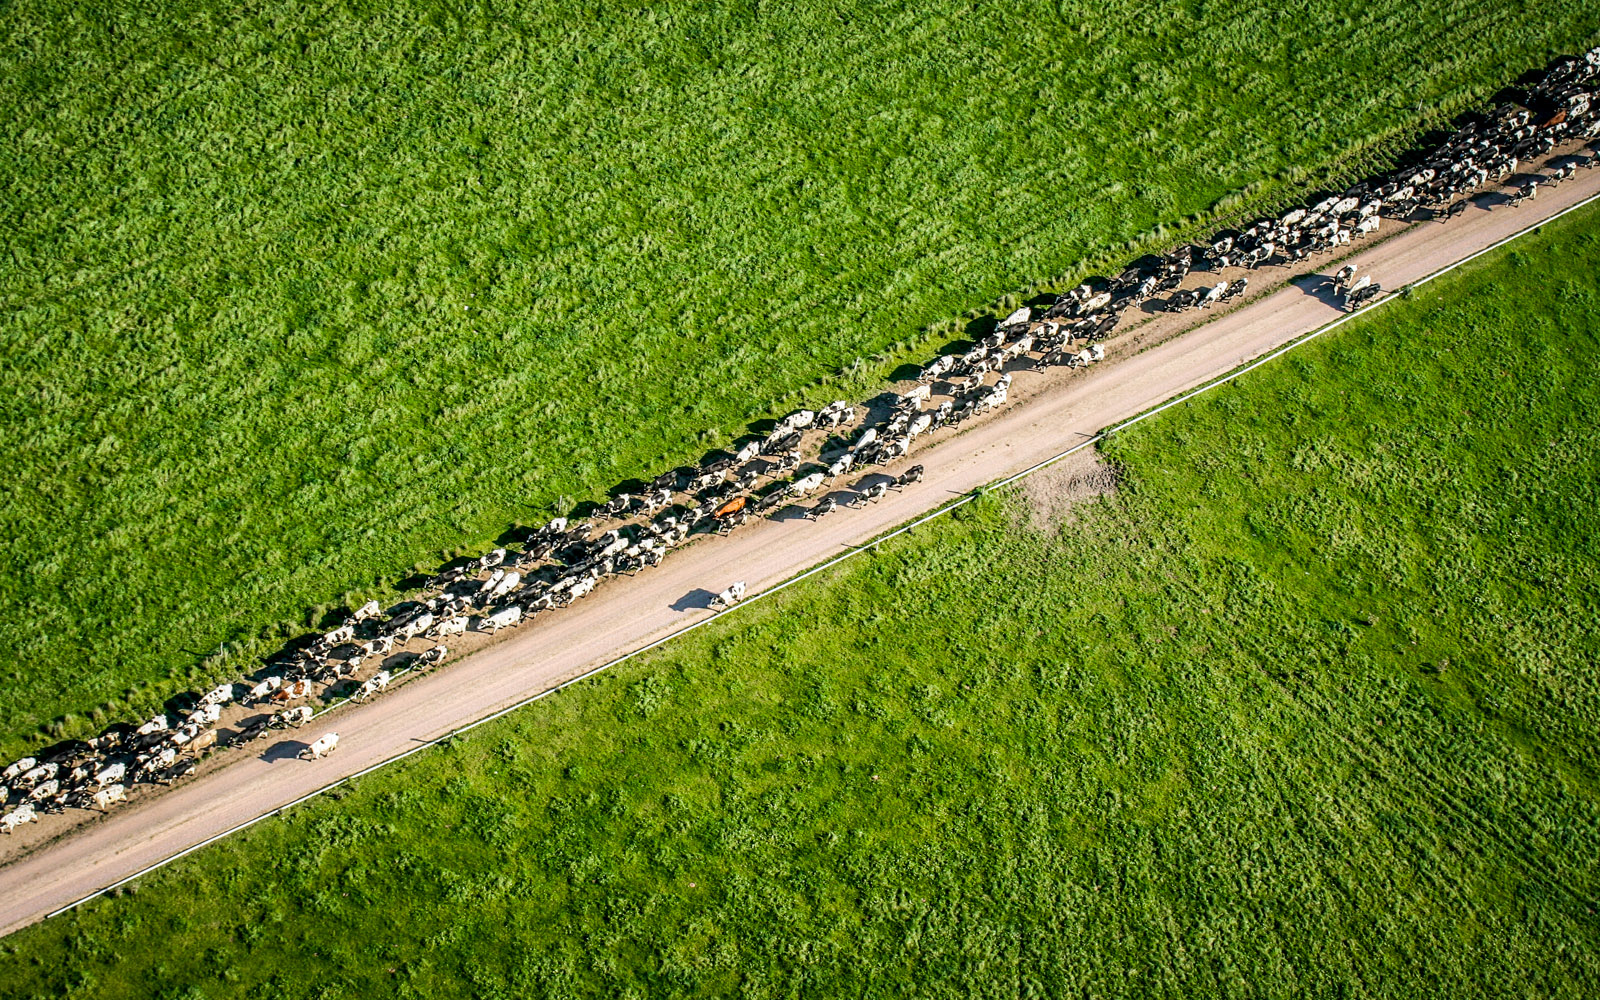 farming photography, agriculture photography, lantbruksfotografering, jordbrukfotografering, almnäs bruk, sverige, sweden, scandinavia, ekologiskt jordbruk, ekologiskt lantbruk, organic farming, organic, cow, cows, ko, kossor